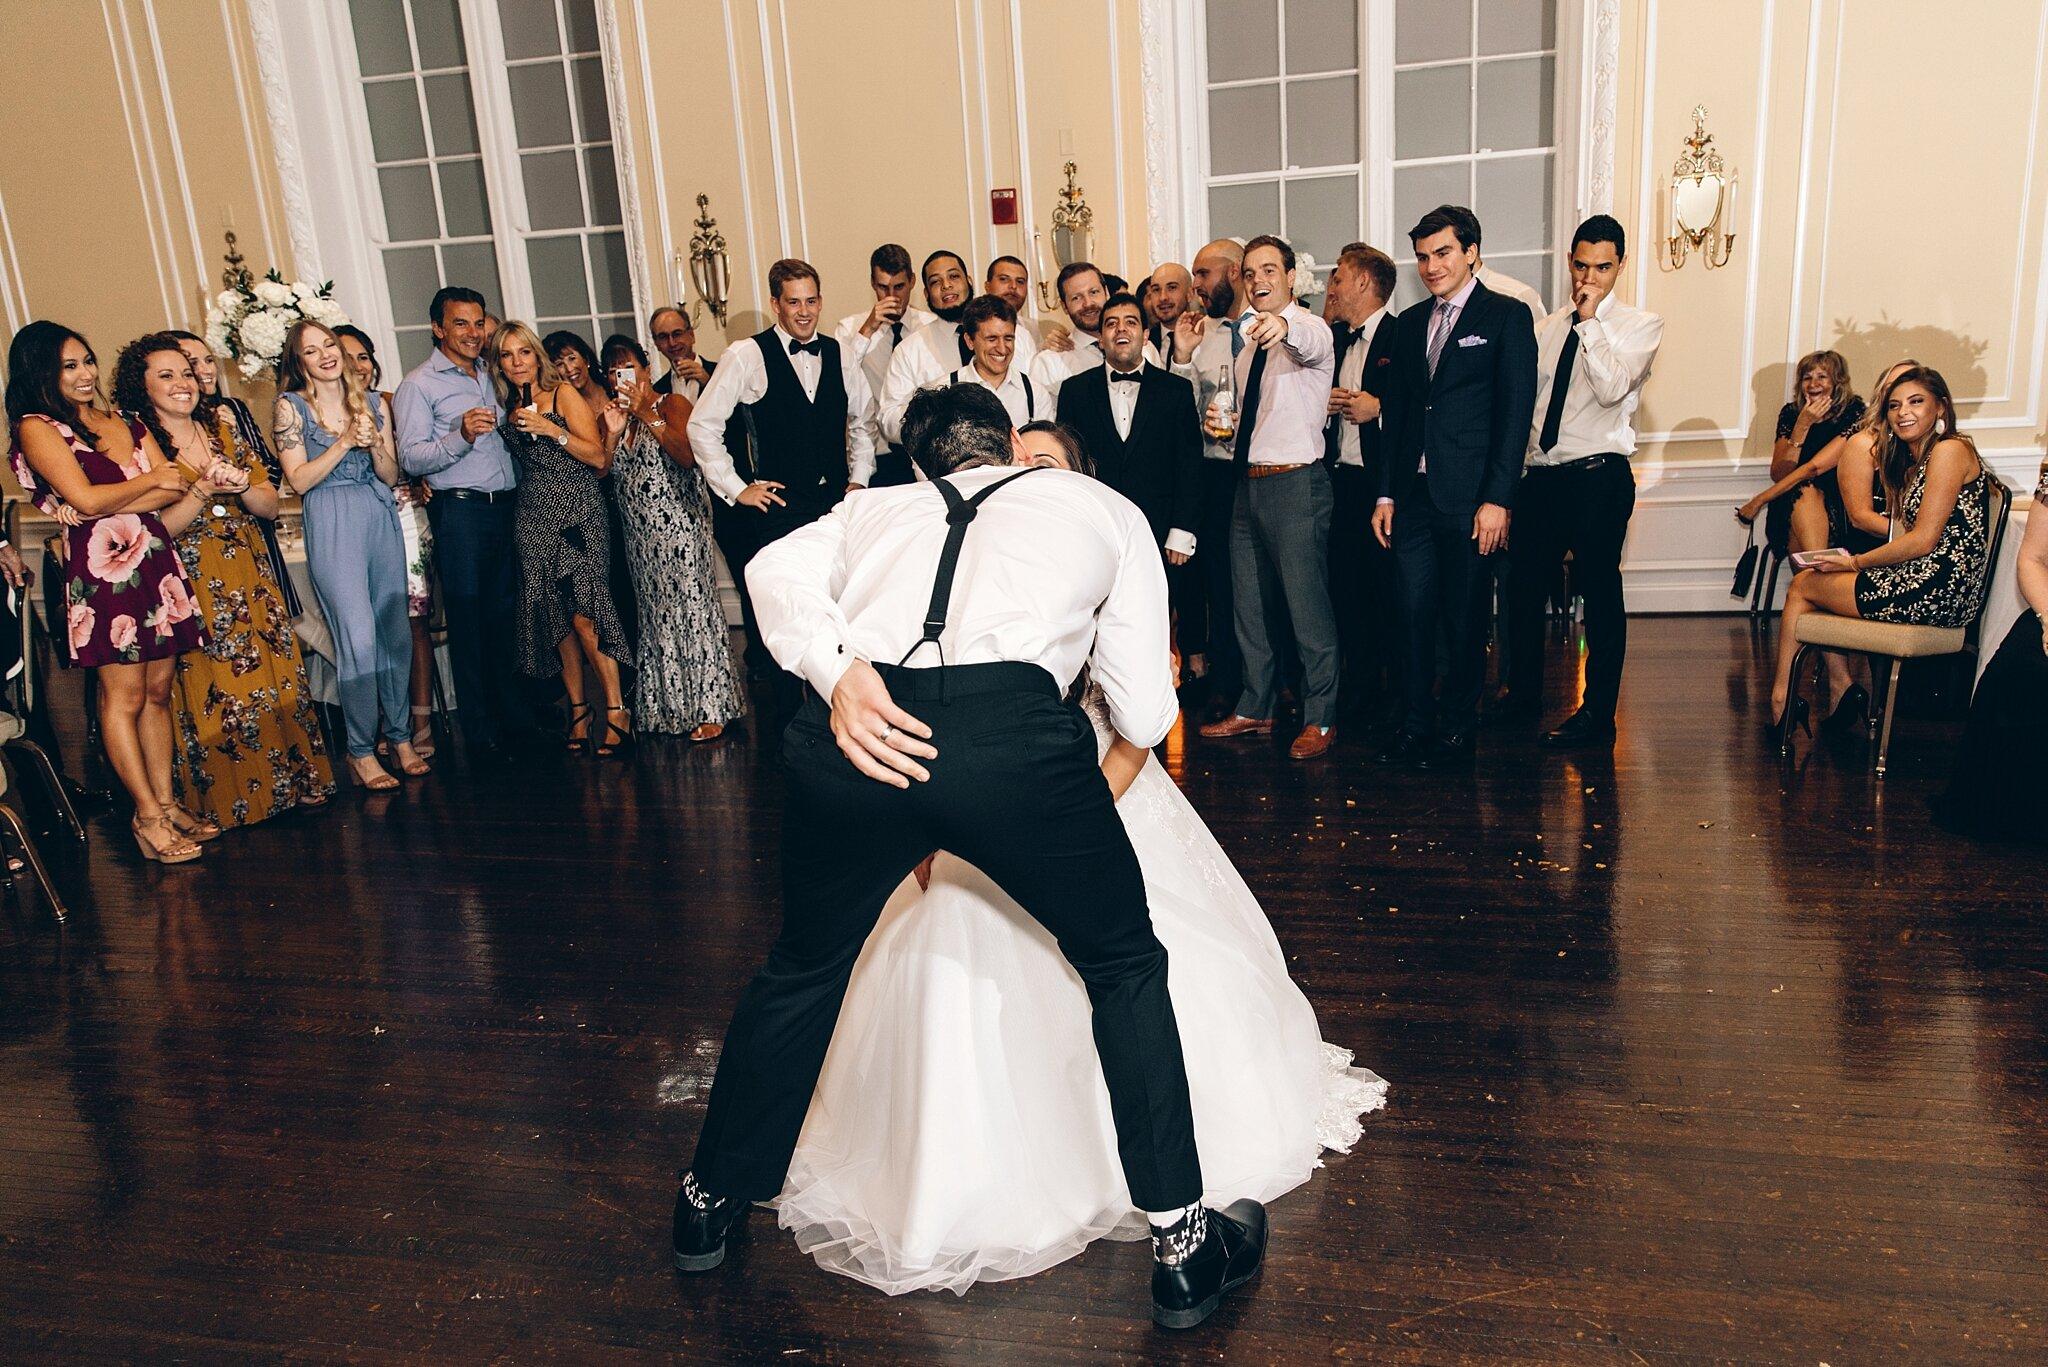 patrick-henry-ballroom-wedding-roanoke_0555.jpg